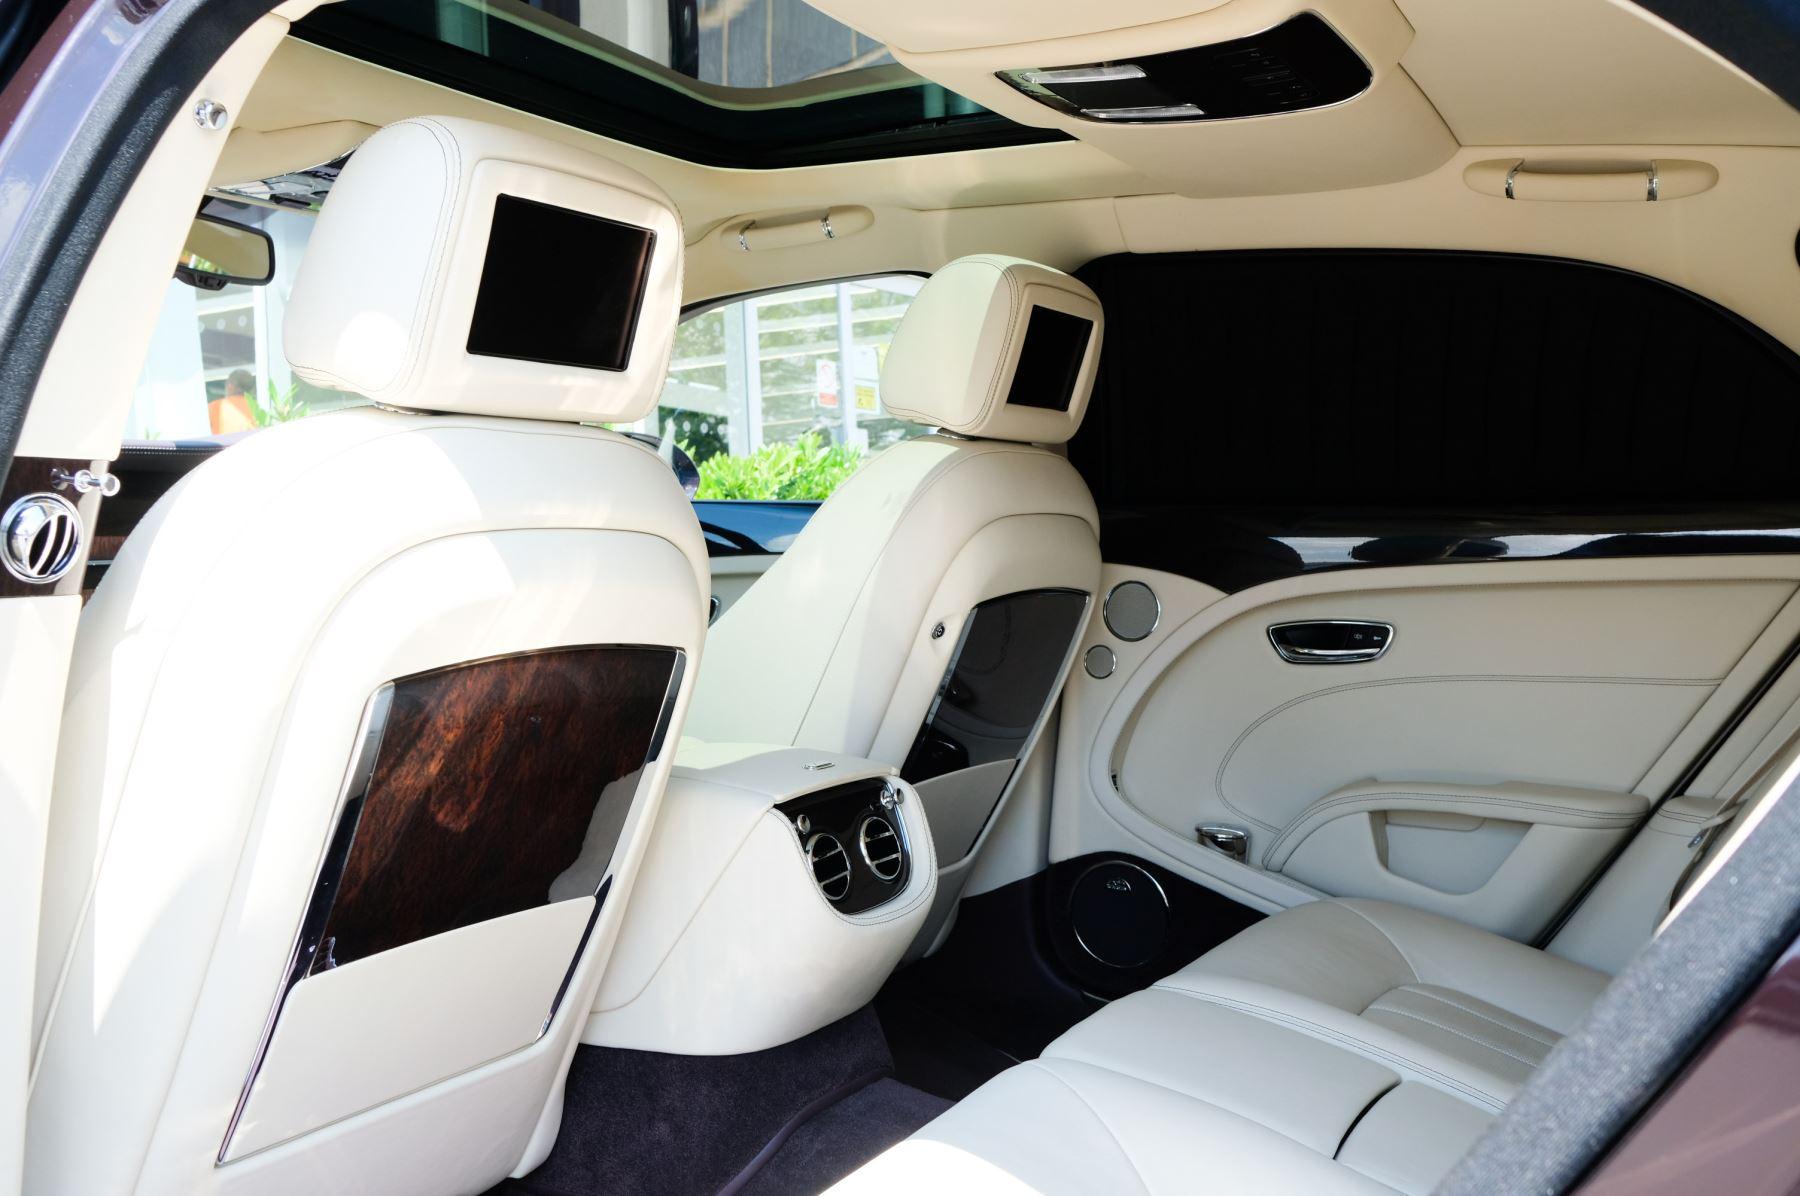 Bentley Mulsanne 6.8 V8 - Comfort, Entertainment and Premier Specification image 14